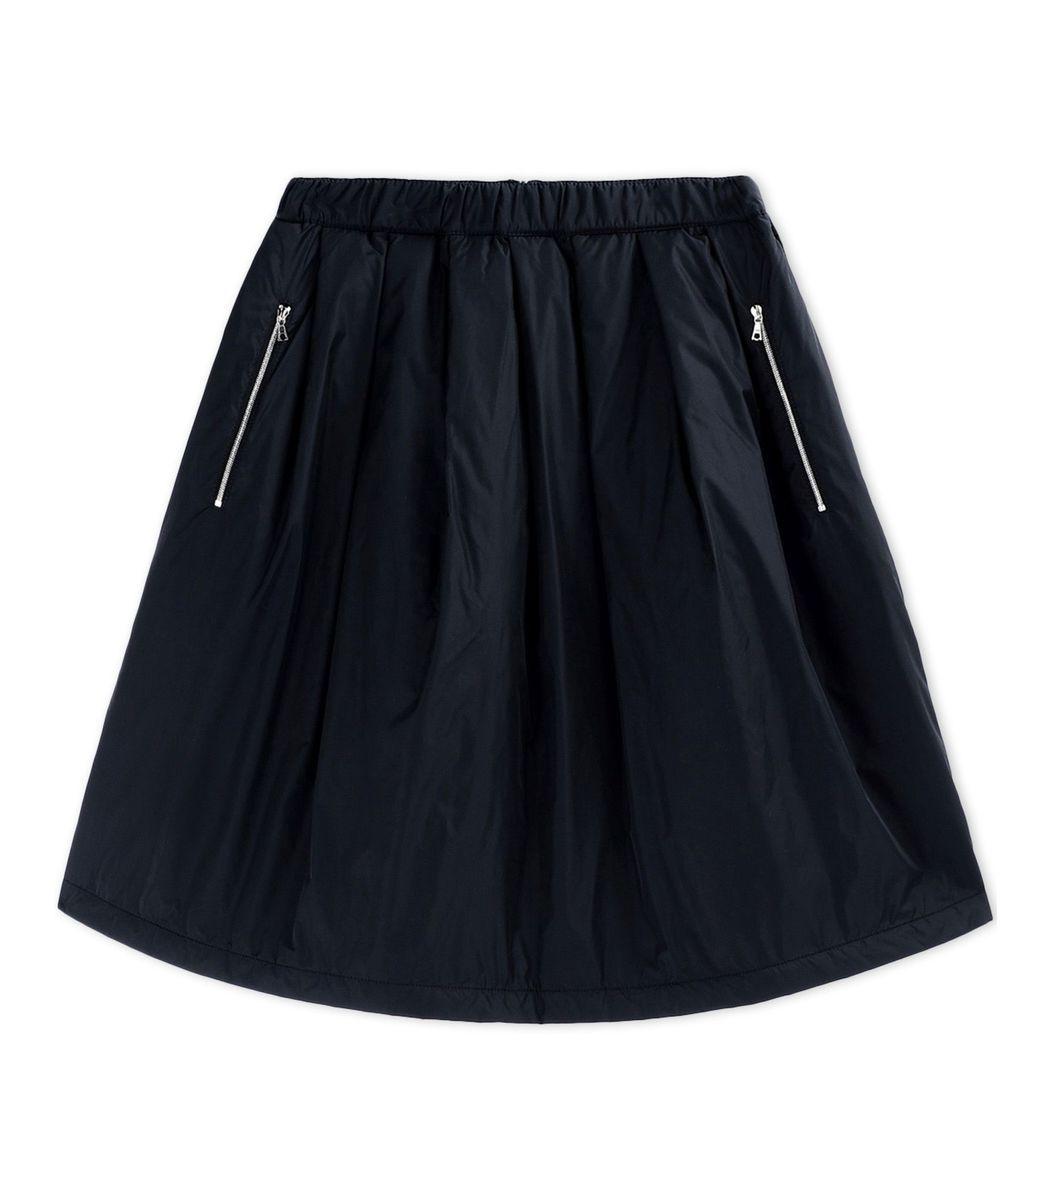 Acne Studios Pimlico Black Quilted Skirt